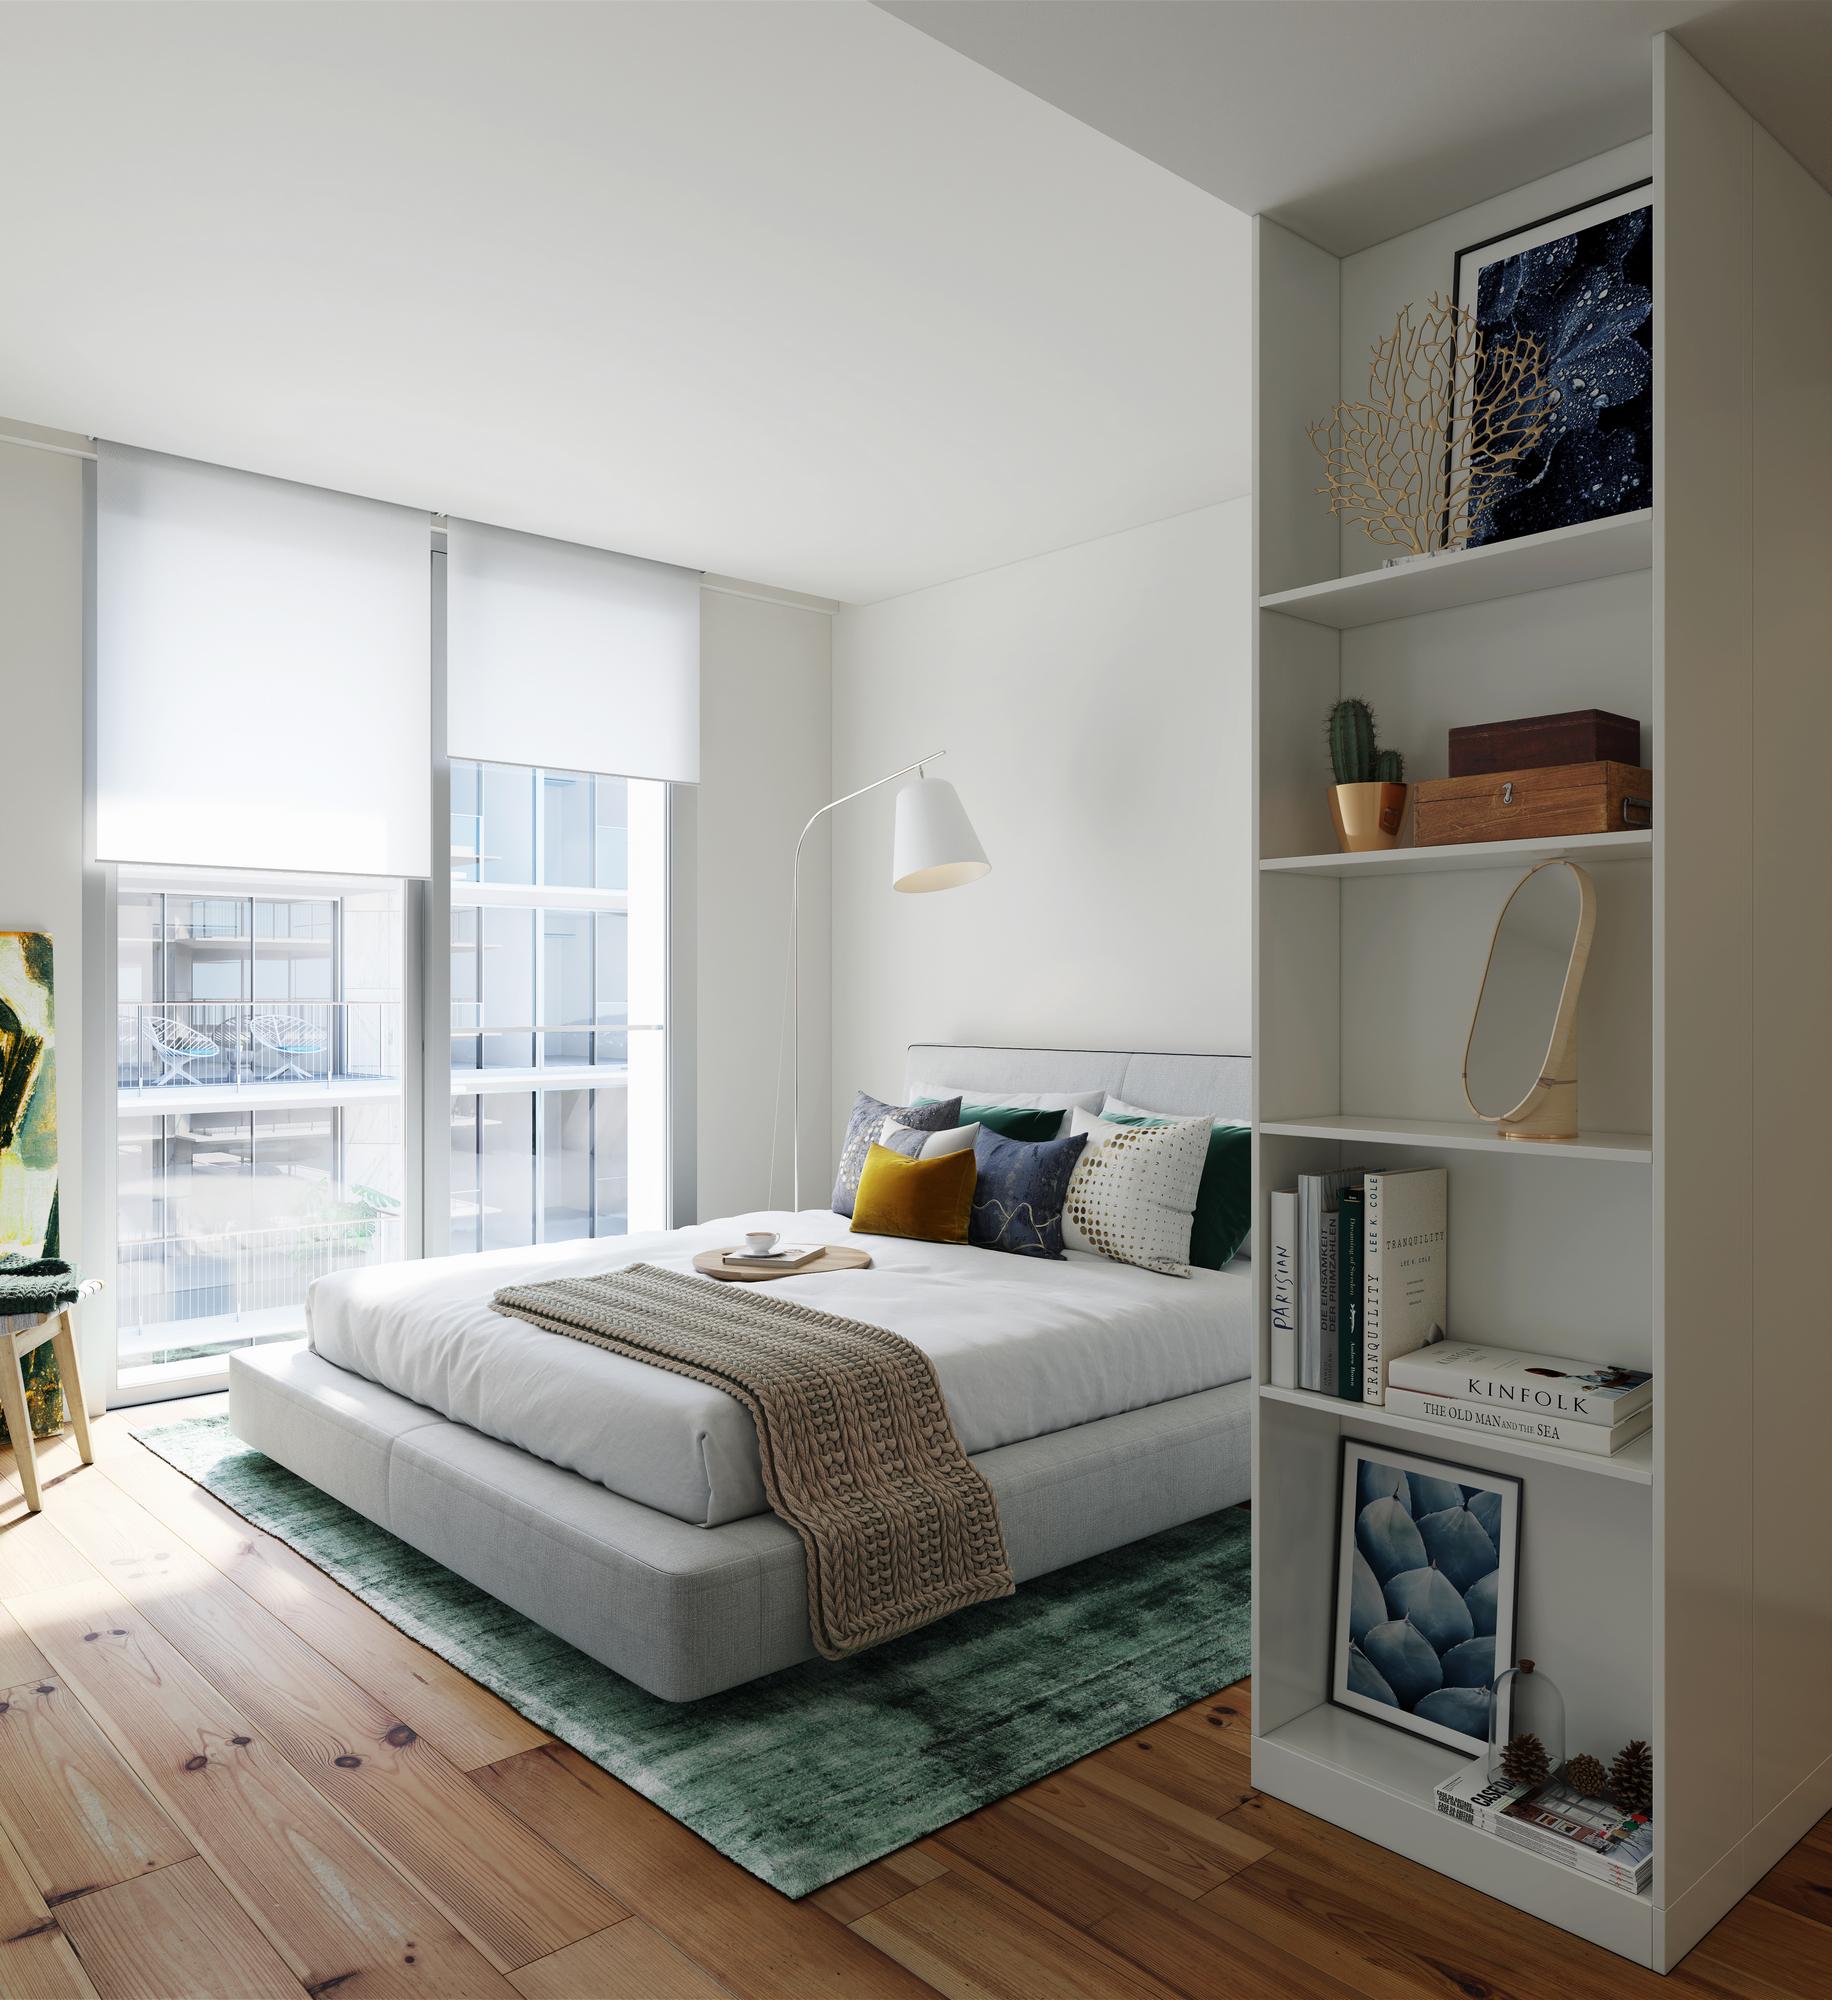 bayline-b1-p4-bedroom